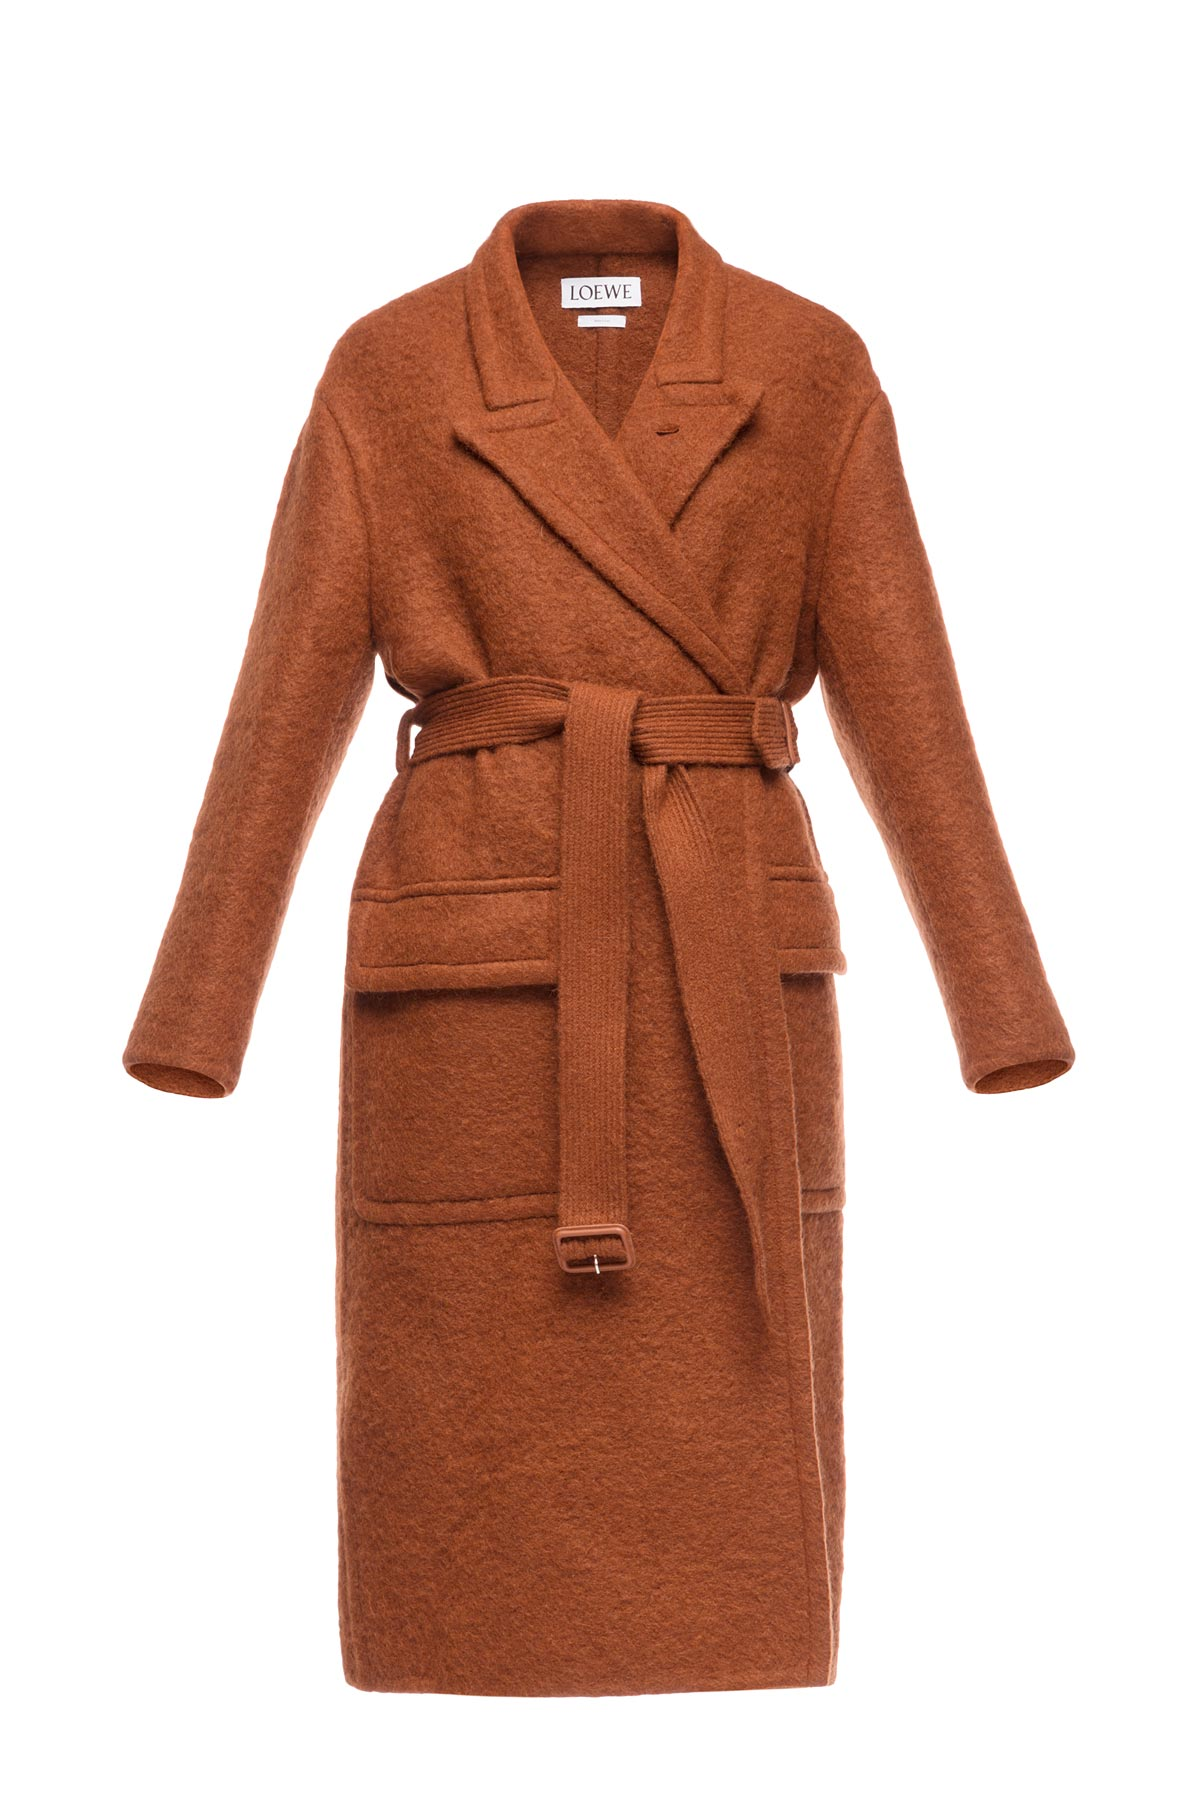 LOEWE Belted Coat Brown front